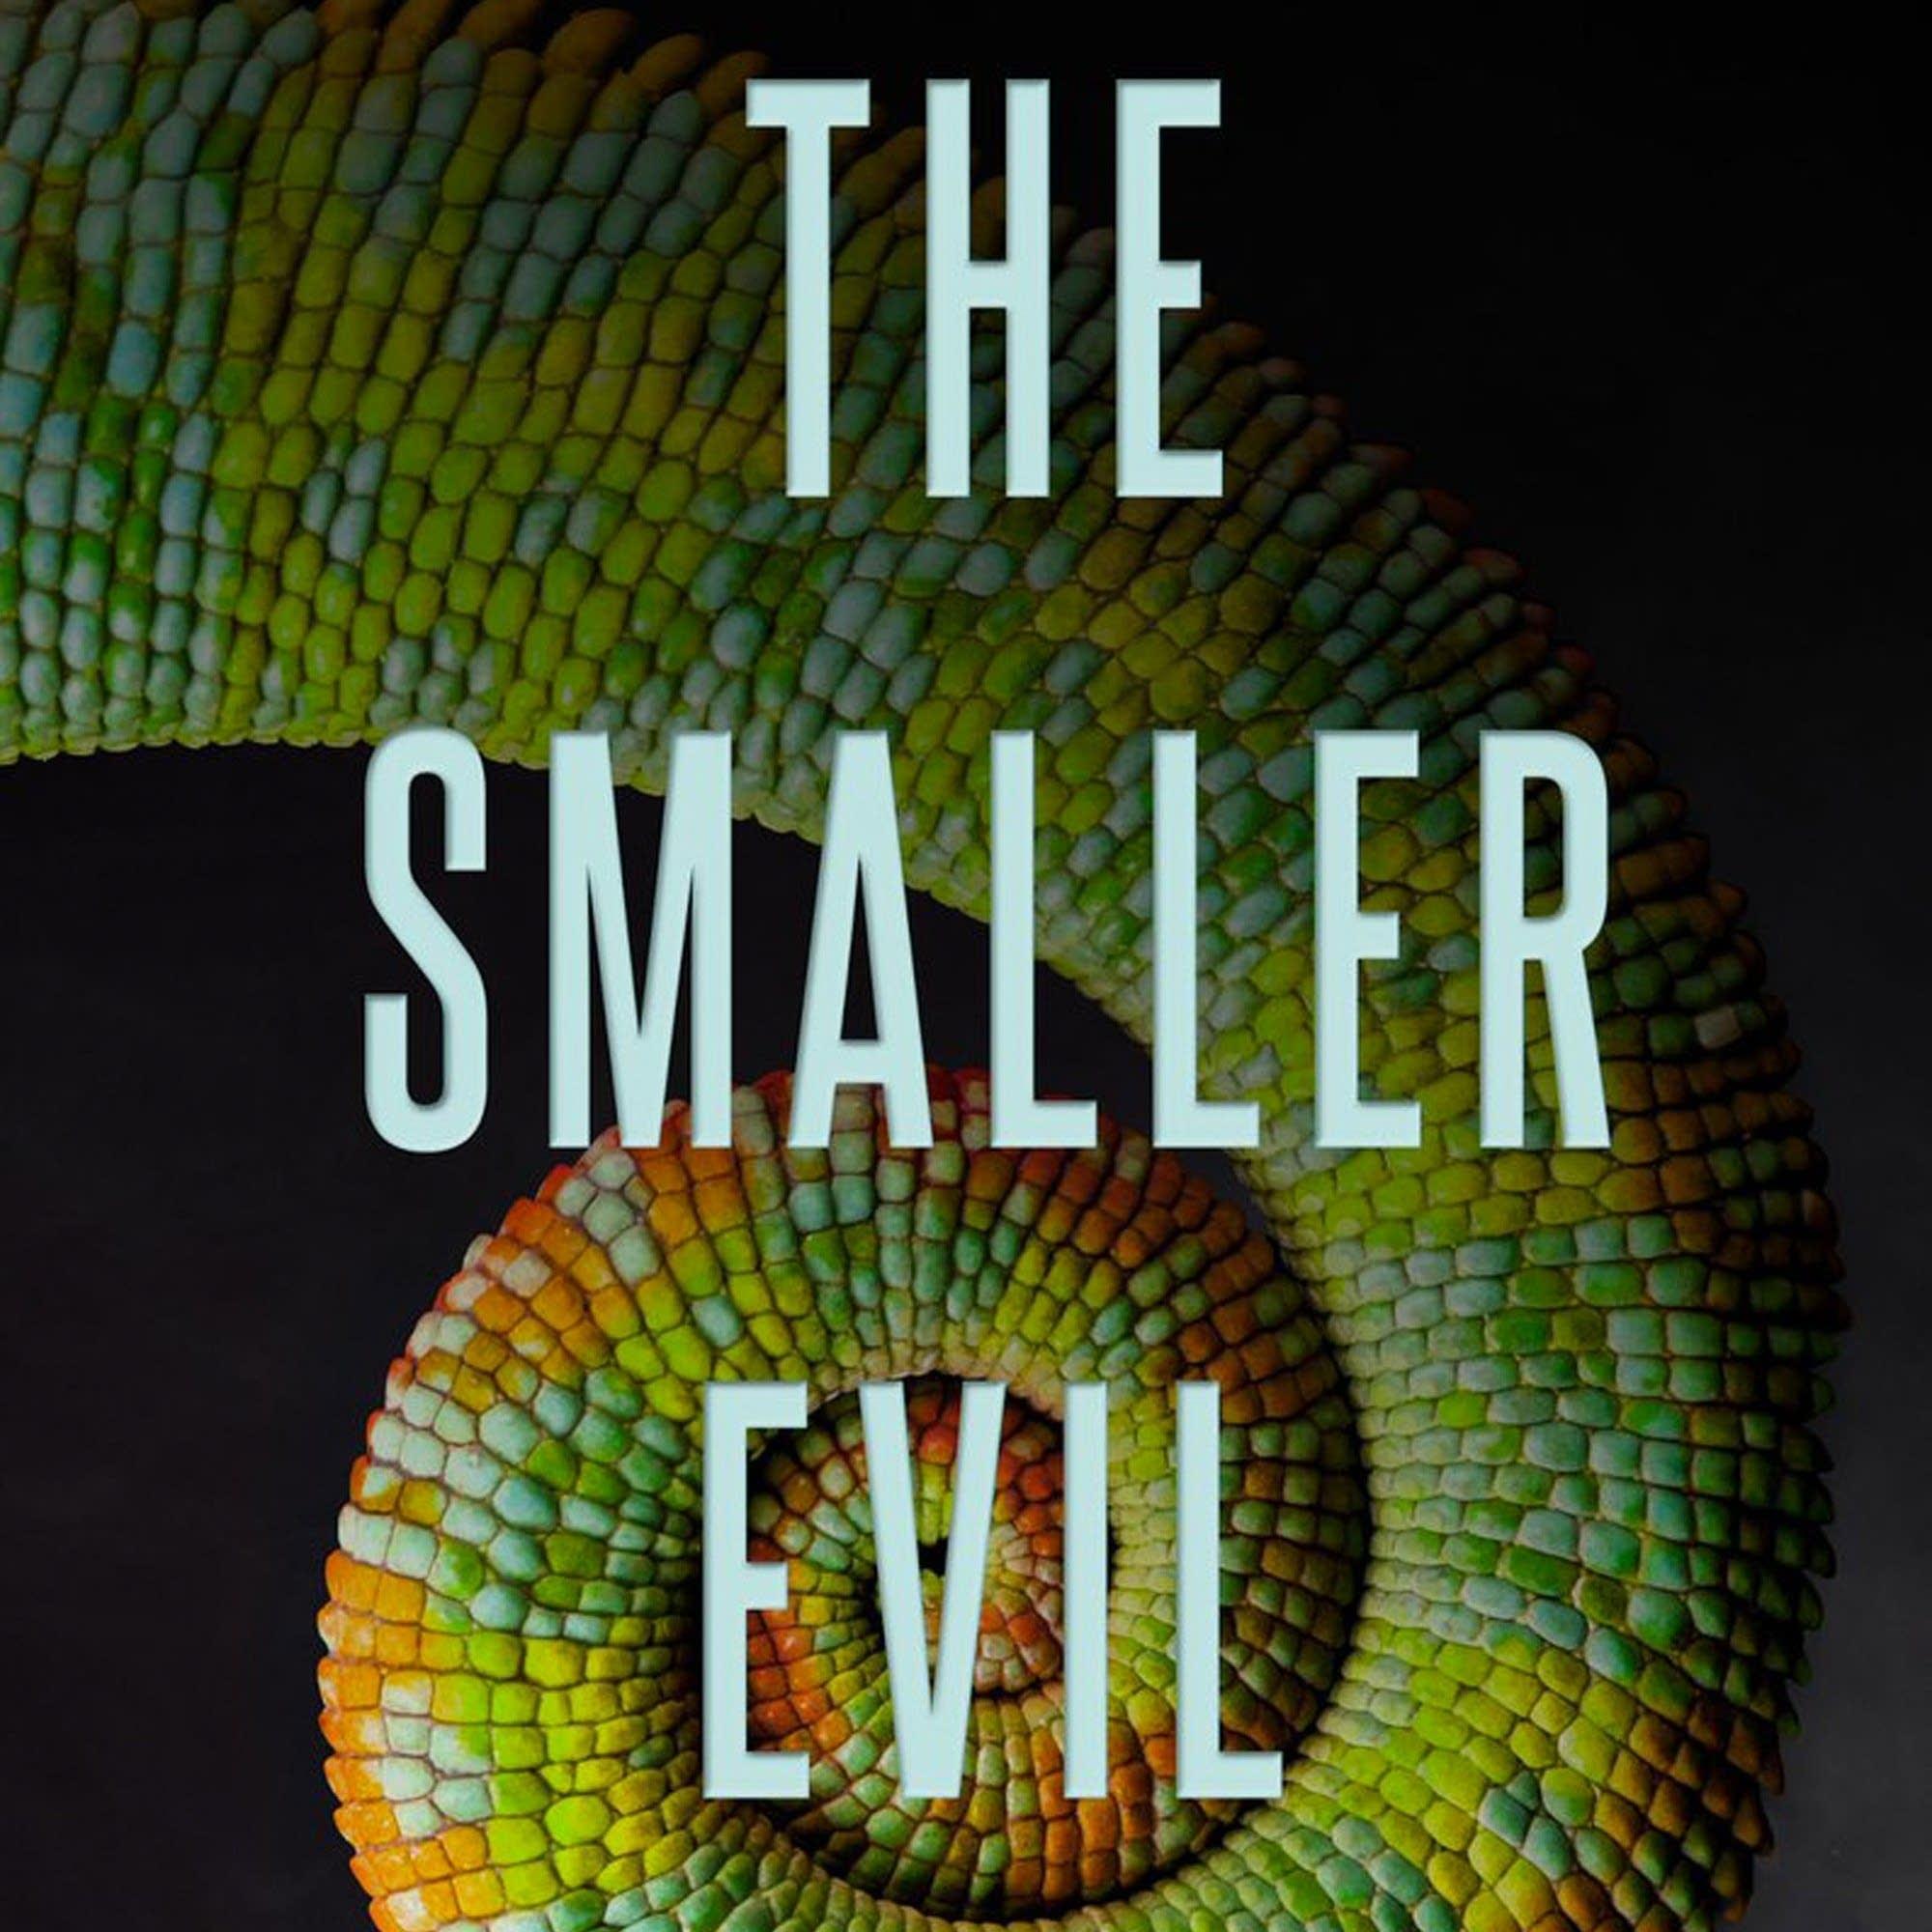 'Smaller Evil' by Stephanie Kuehn